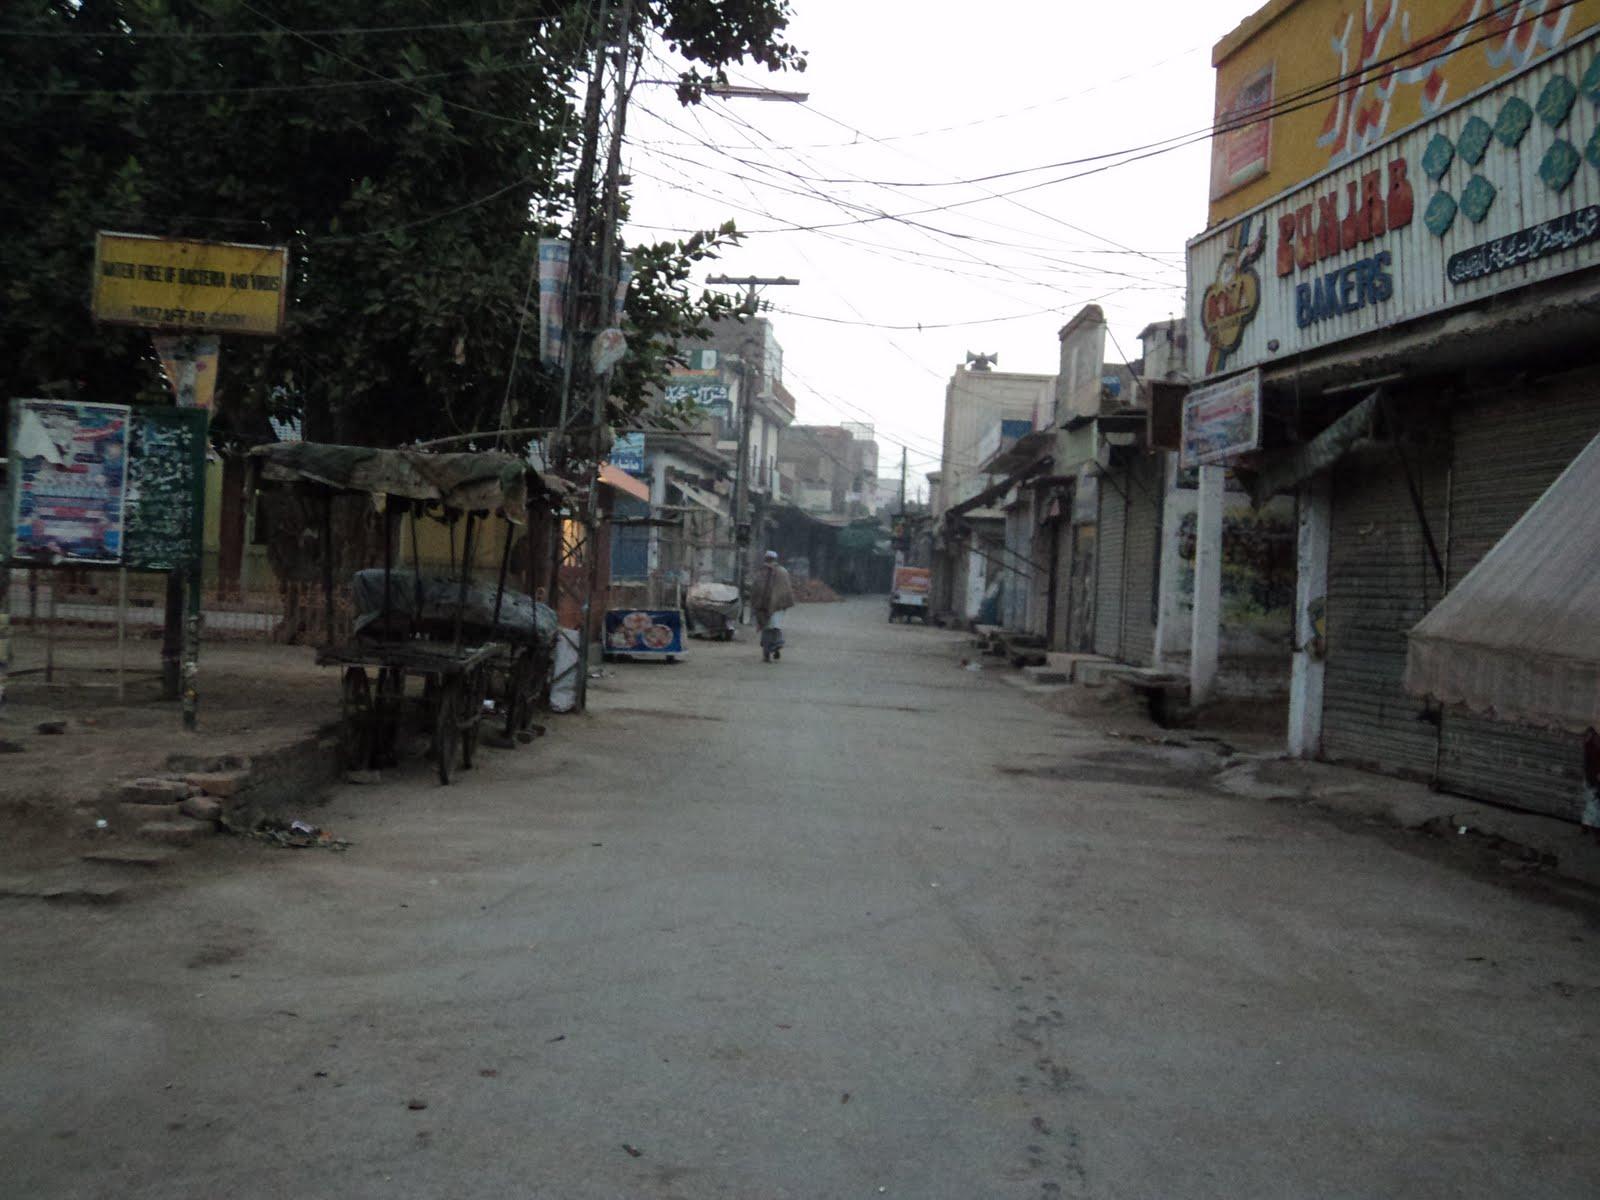 muzaffargarh single girls Muzaffargarh district ( urdu : ضِلع مُظفّرگڑھ ) is a district of the punjab province of pakistan its capital is muzaffargarh.